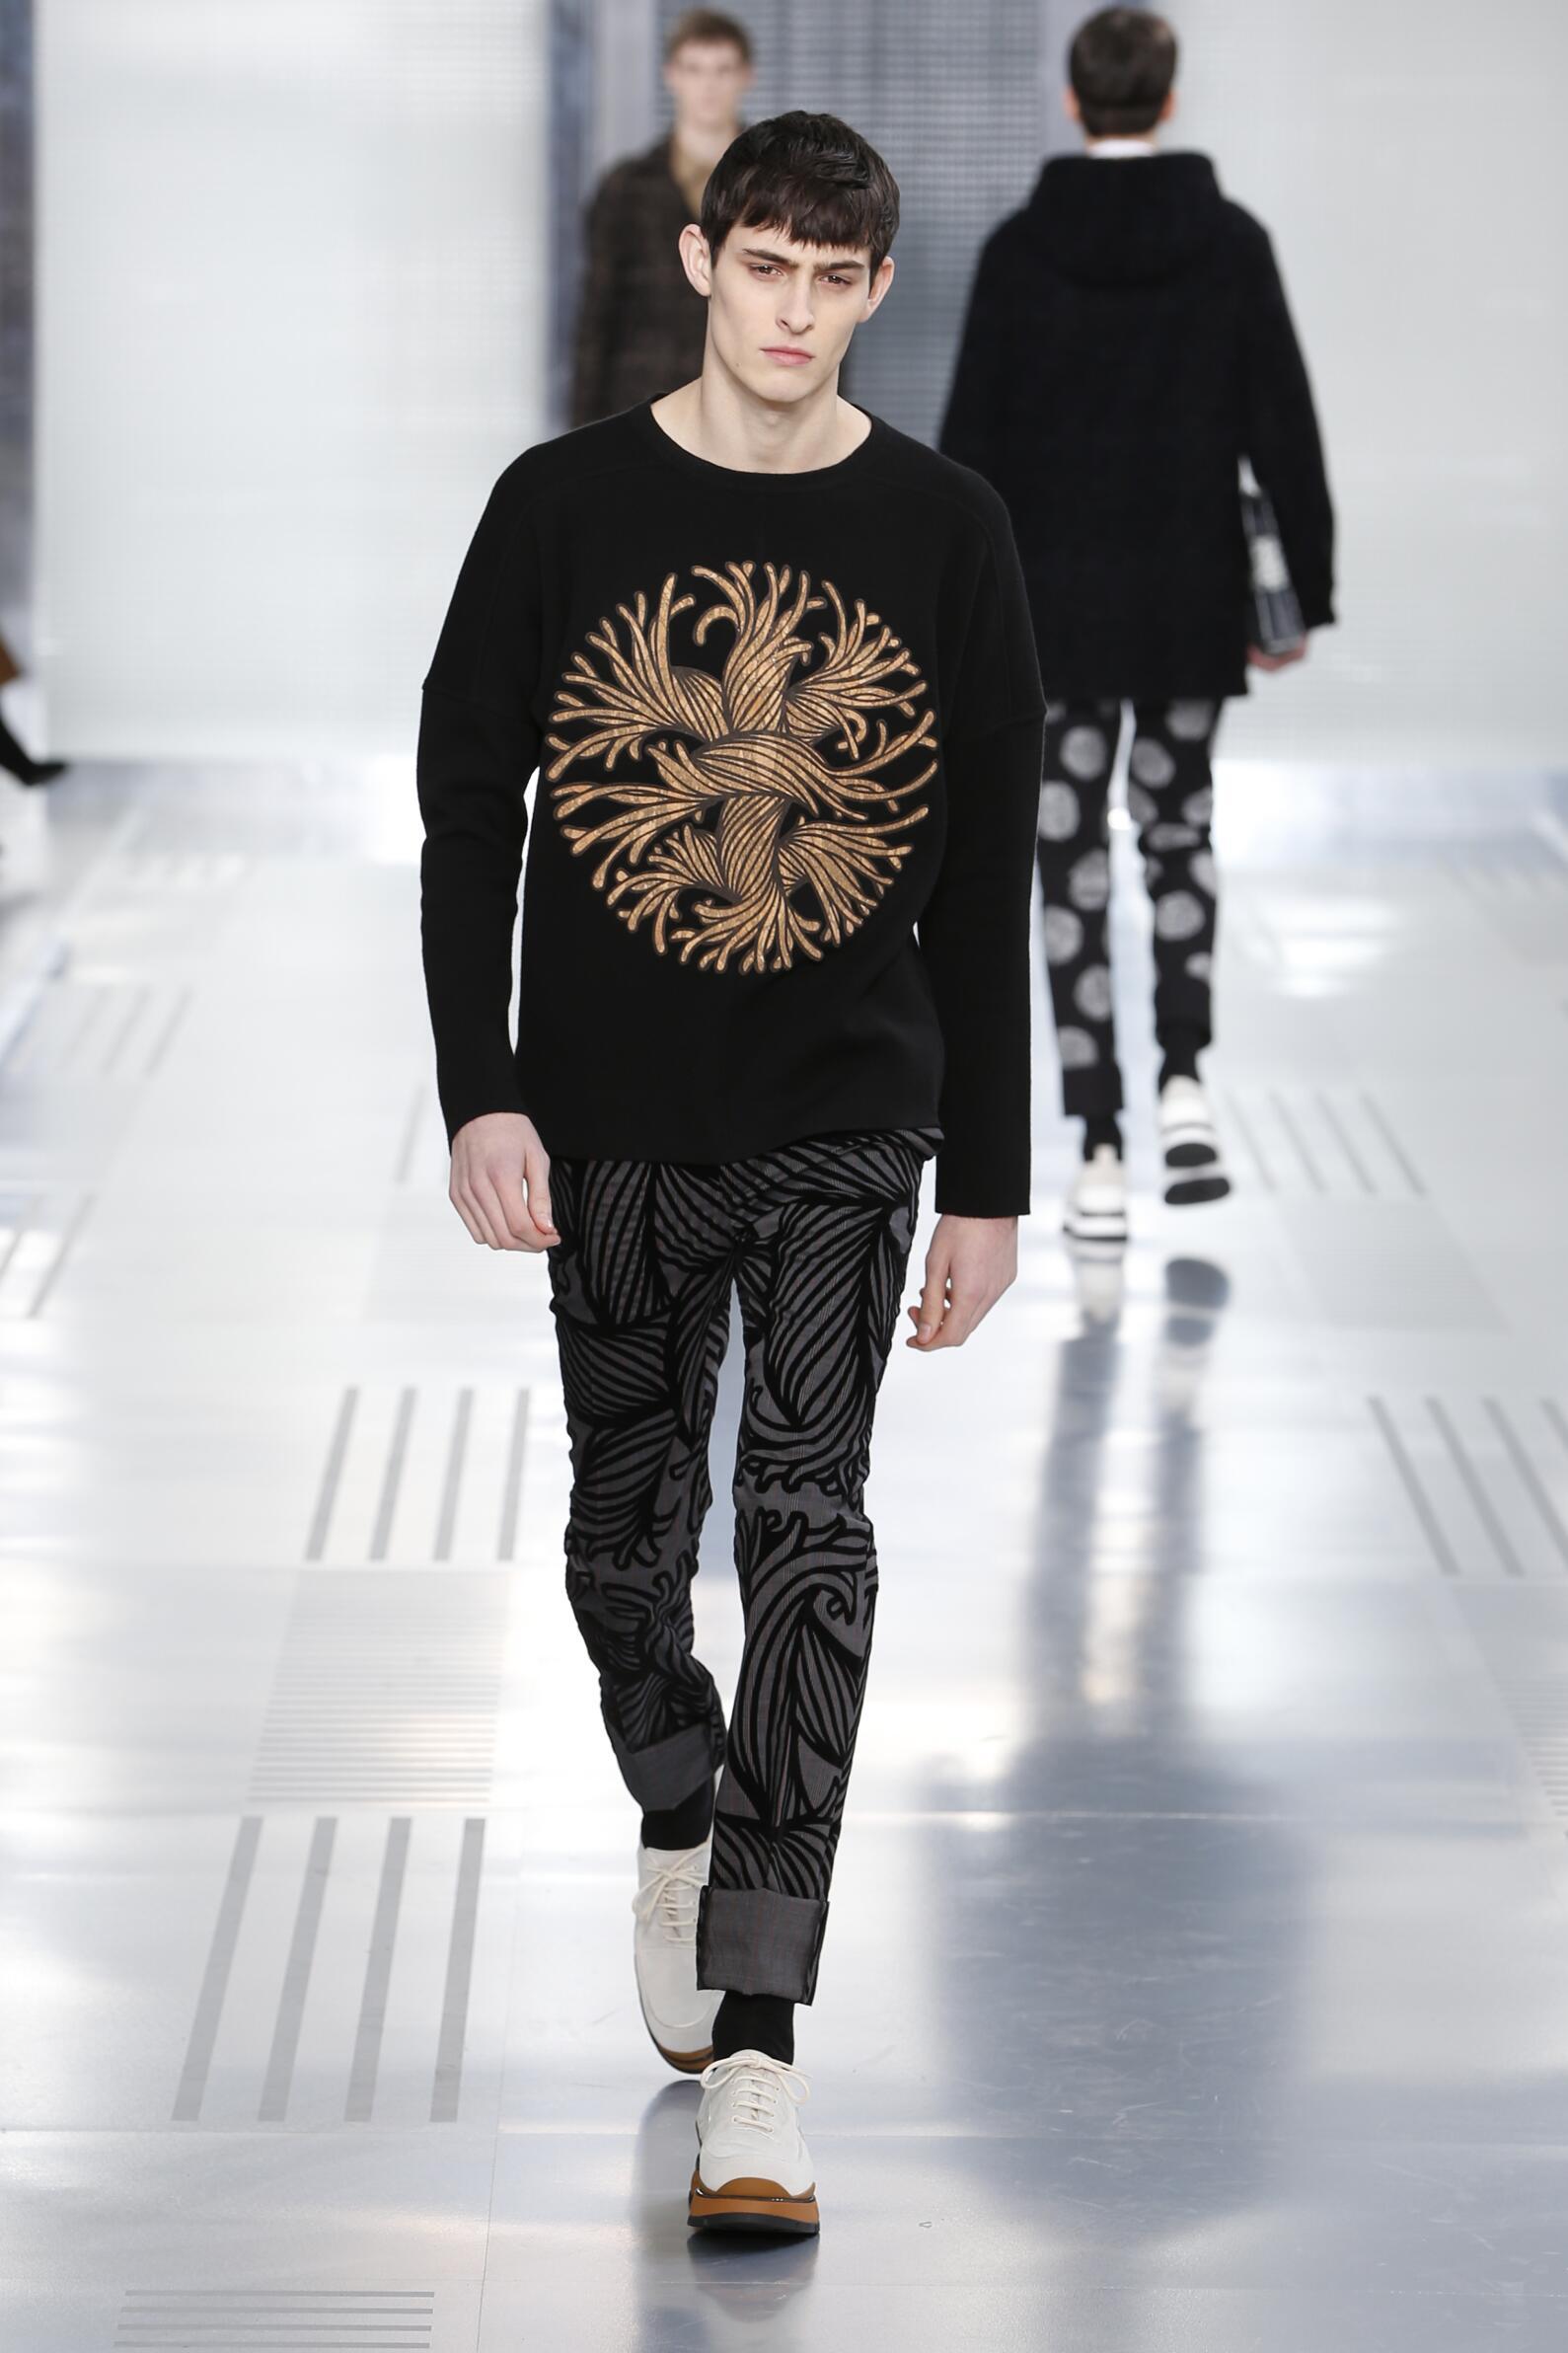 Louis Vuitton Collection Winter 2015 Catwalk